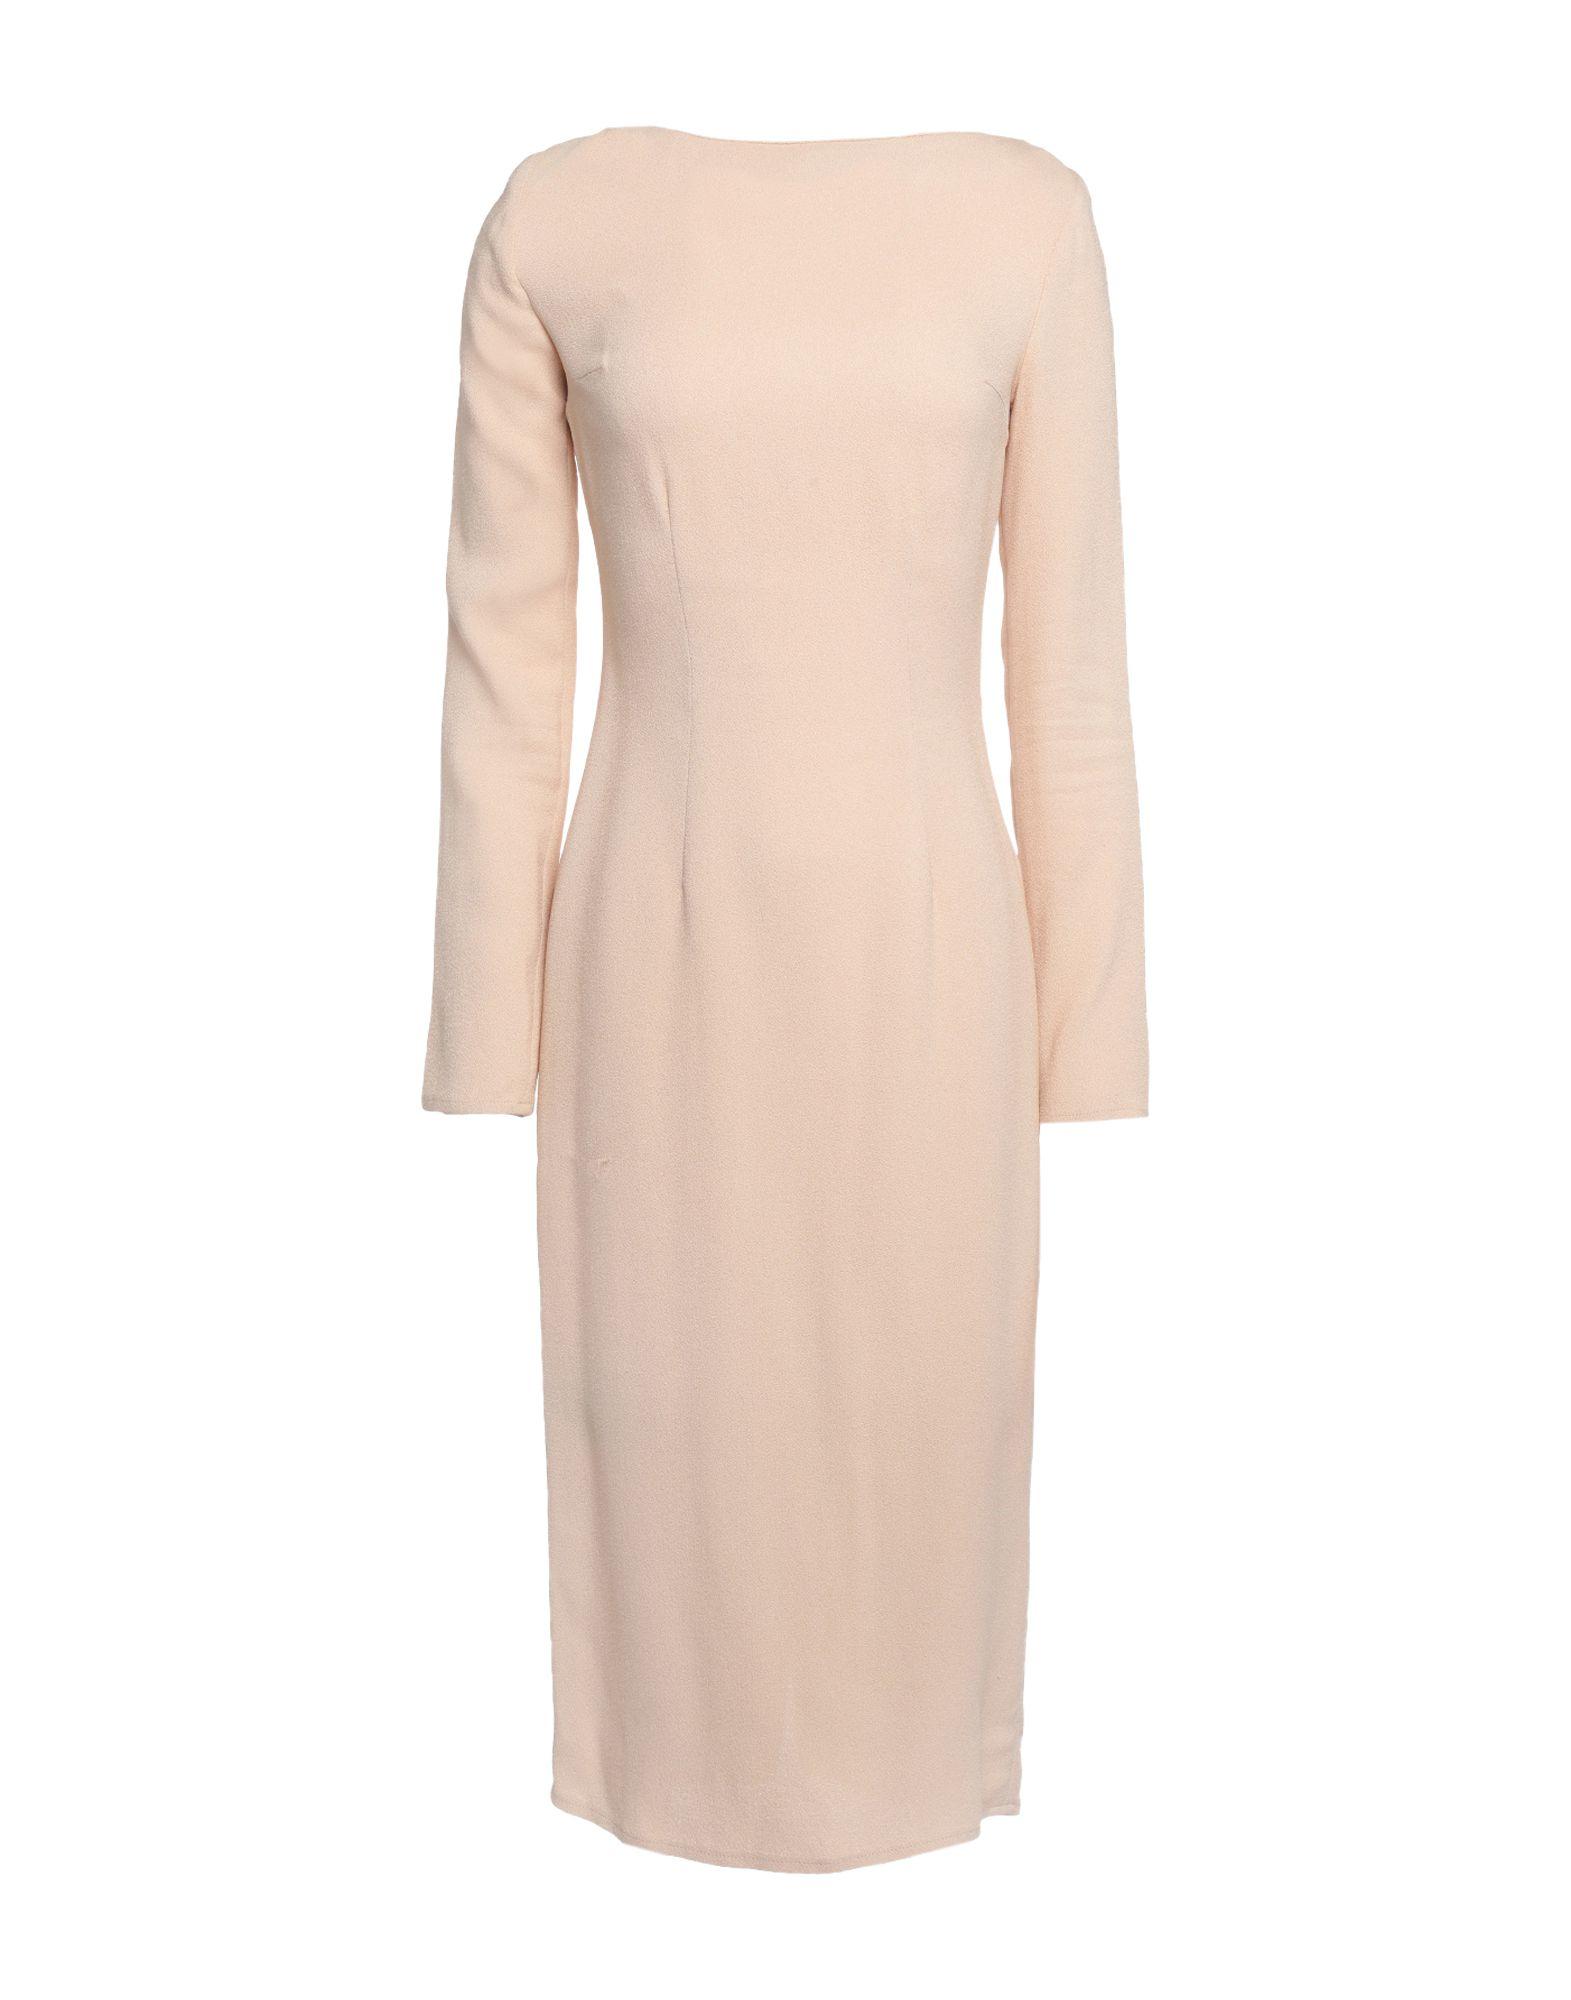 PASSEPARTOUT DRESS by ELISABETTA FRANCHI CELYN b. Платье длиной 3/4 round neck 3 4 sleeve full lace bodycon wedding dress